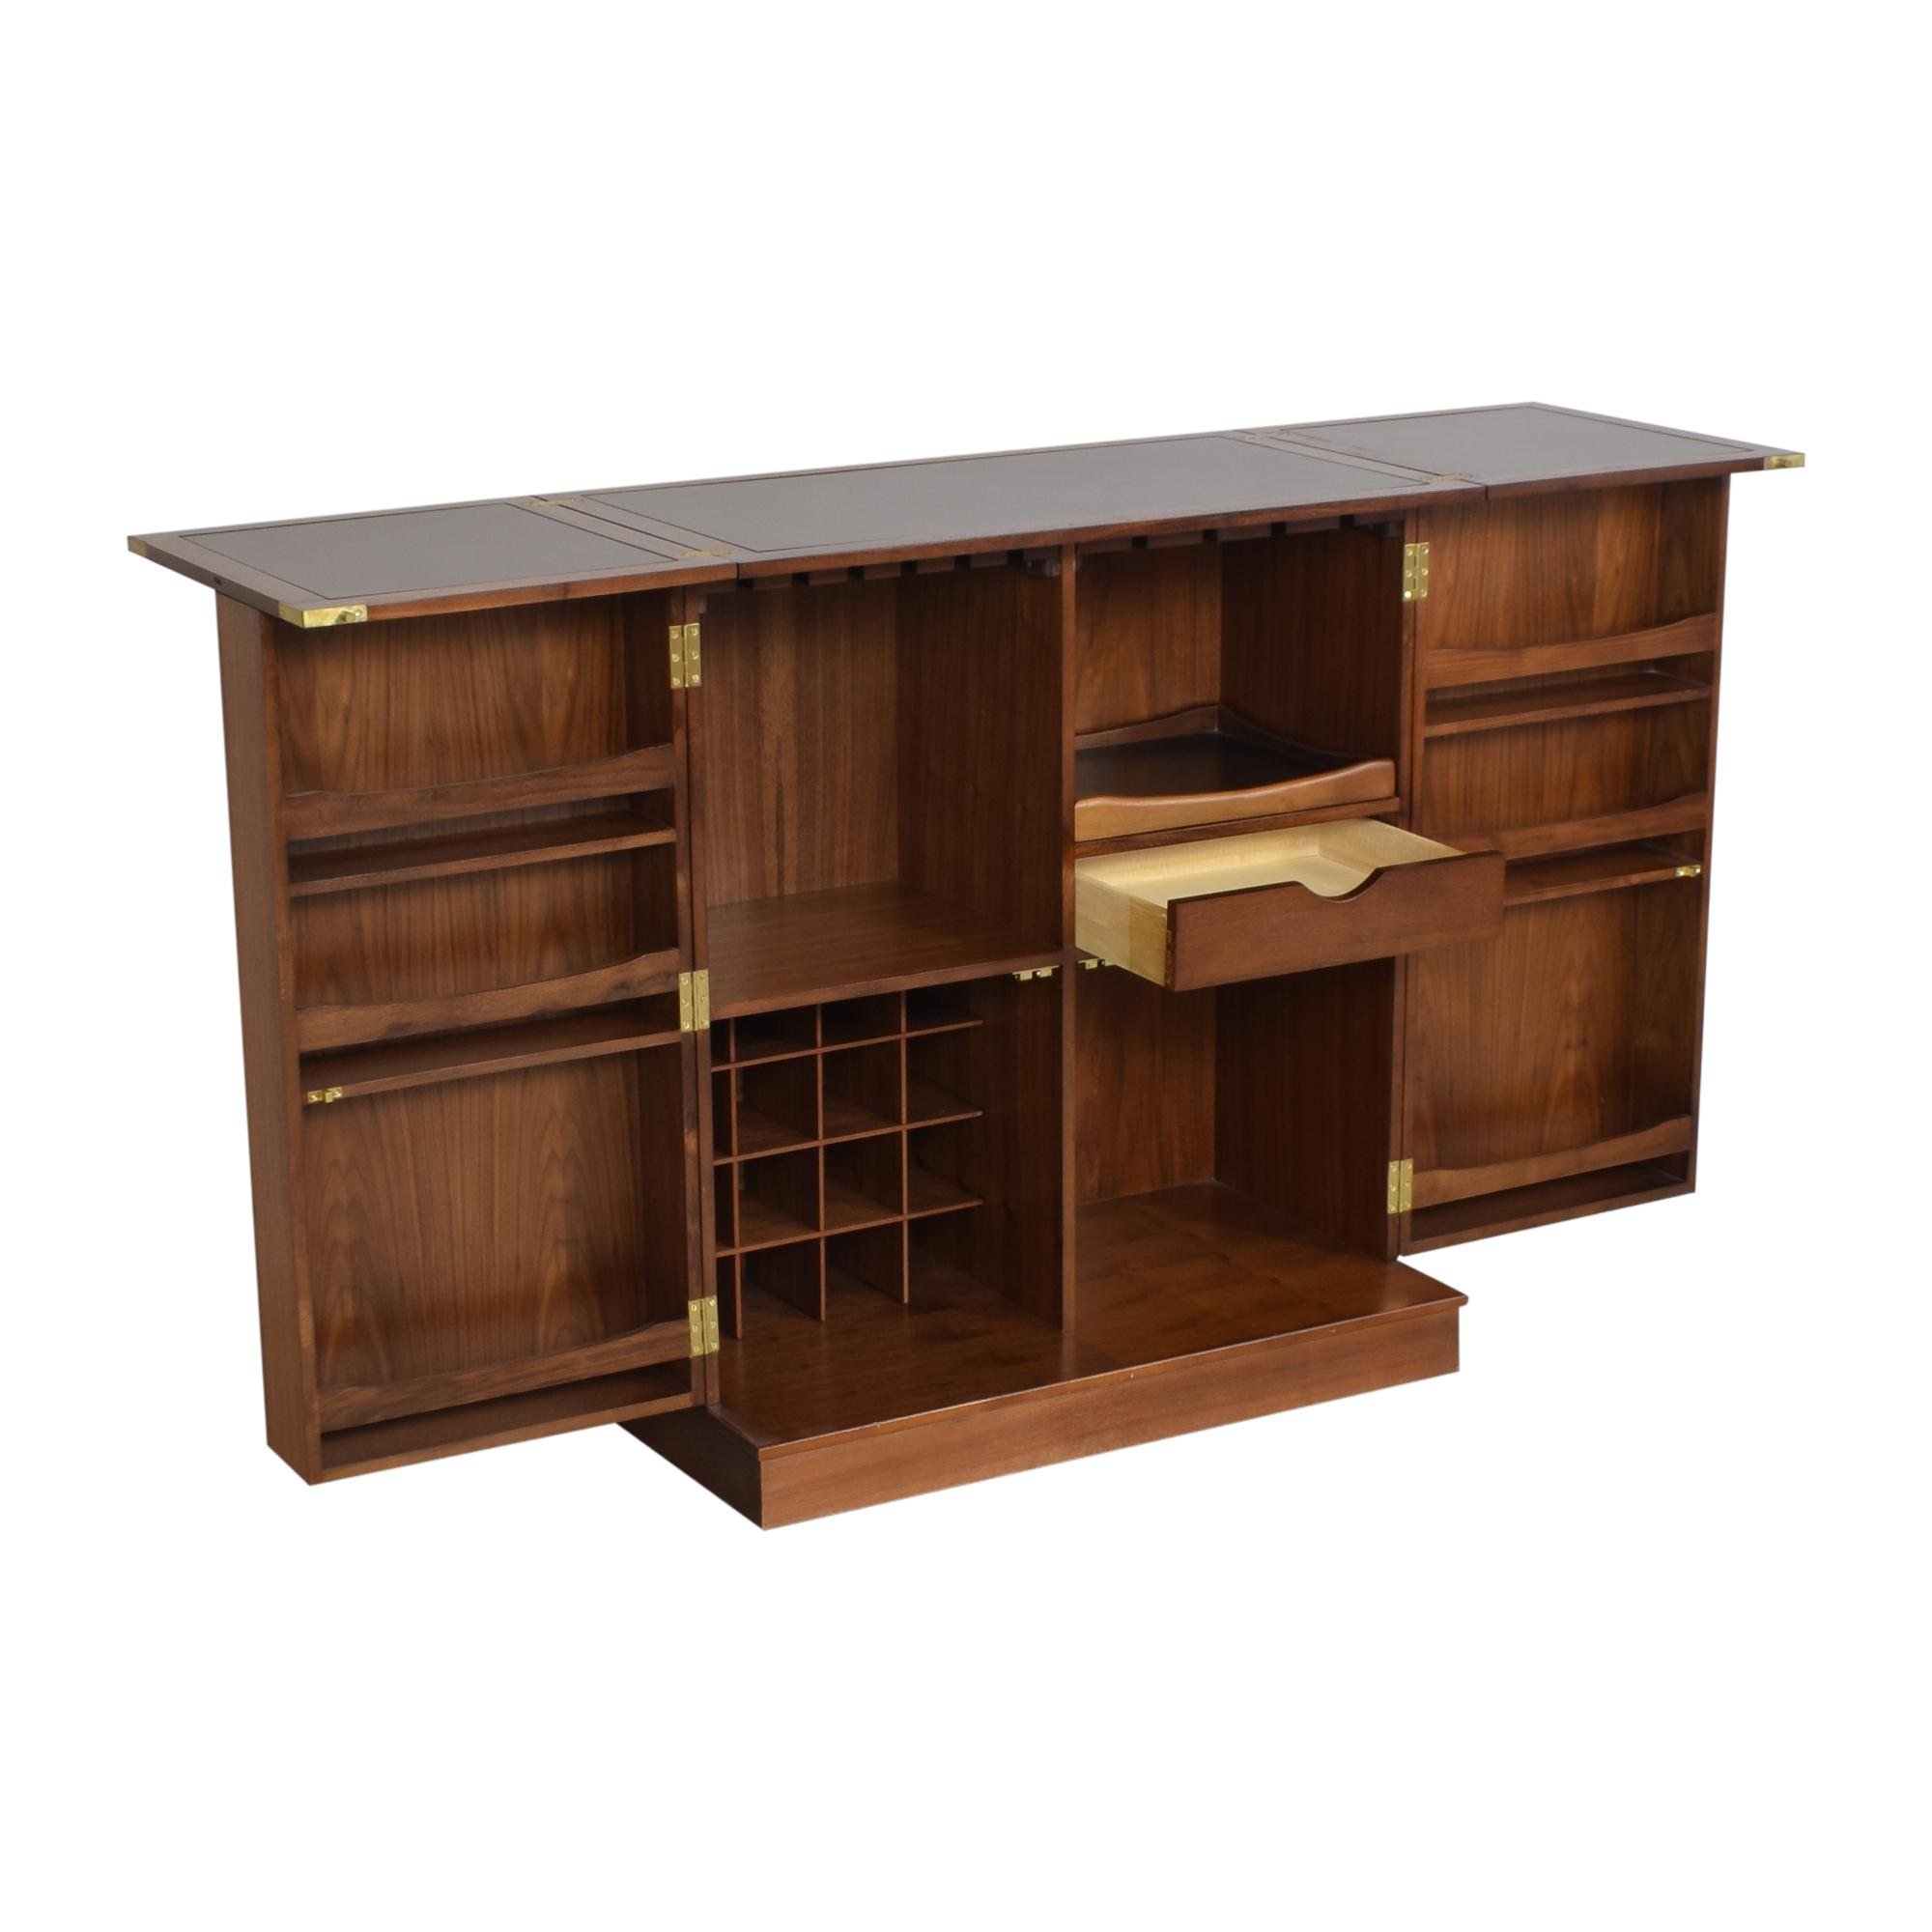 Crate & Barrel Crate & Barrel Maxine Bar Cabinet Cabinets & Sideboards